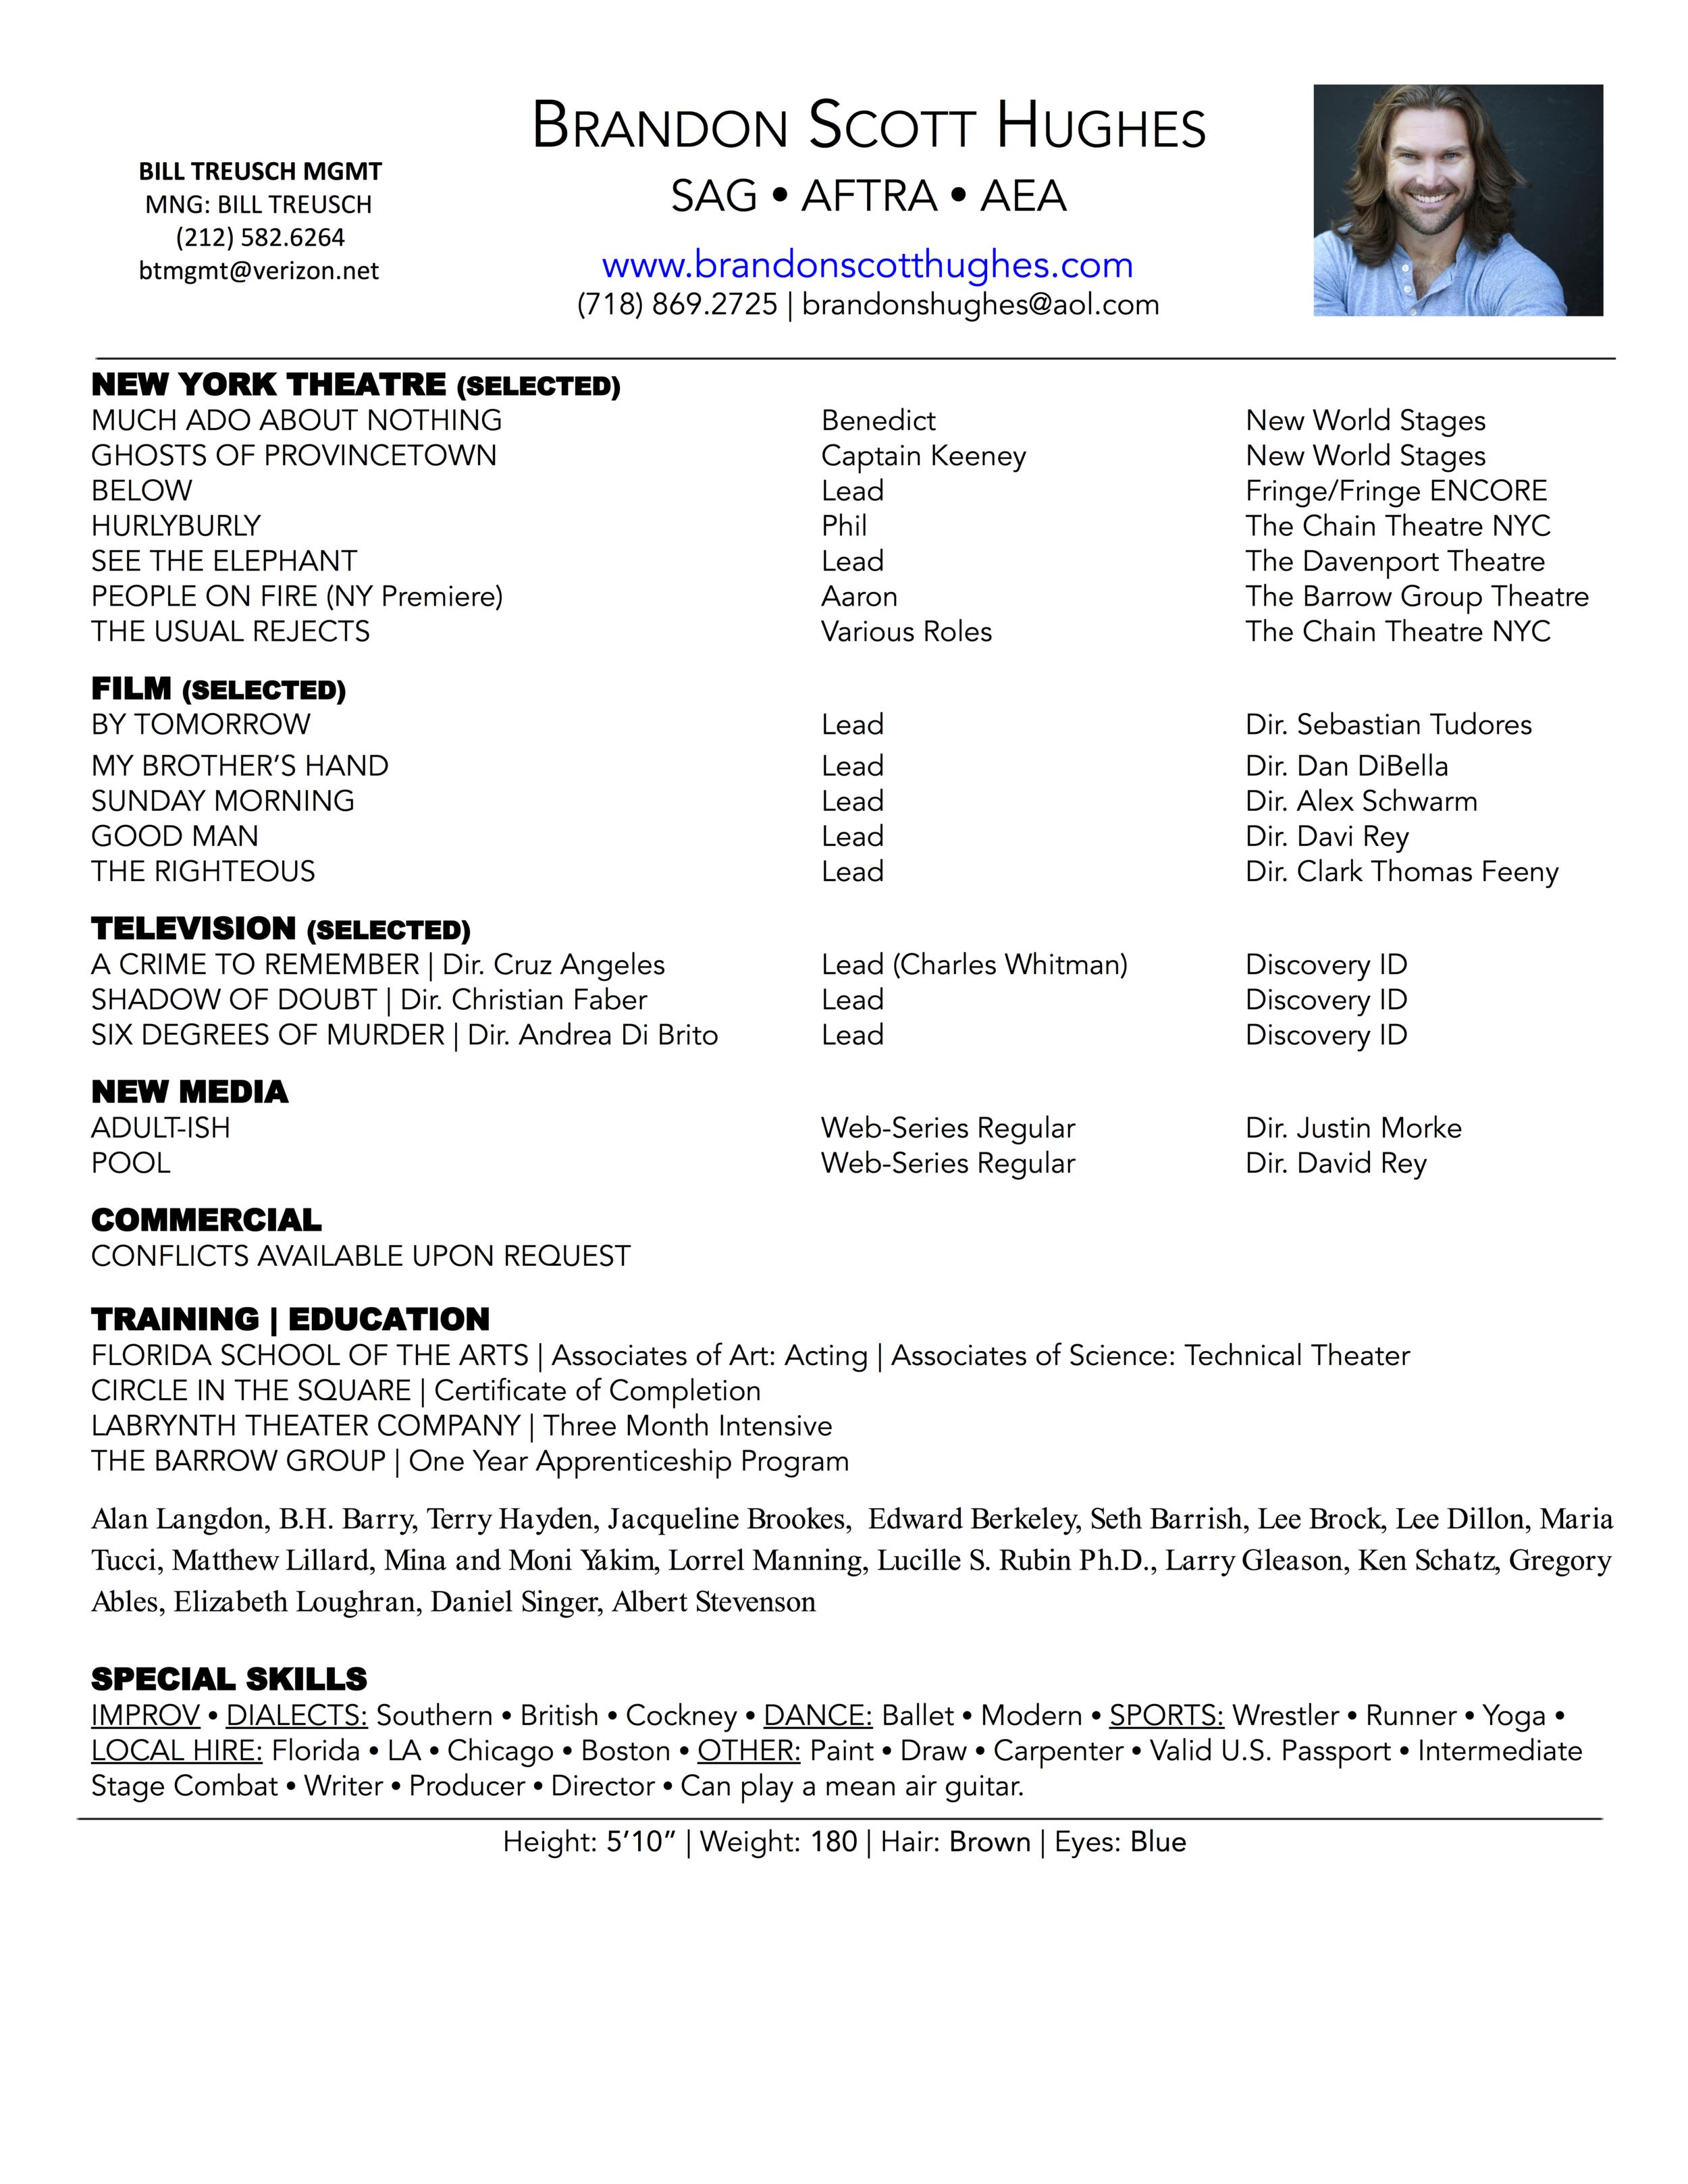 Brandon_Scott_Hughes_Resume.png